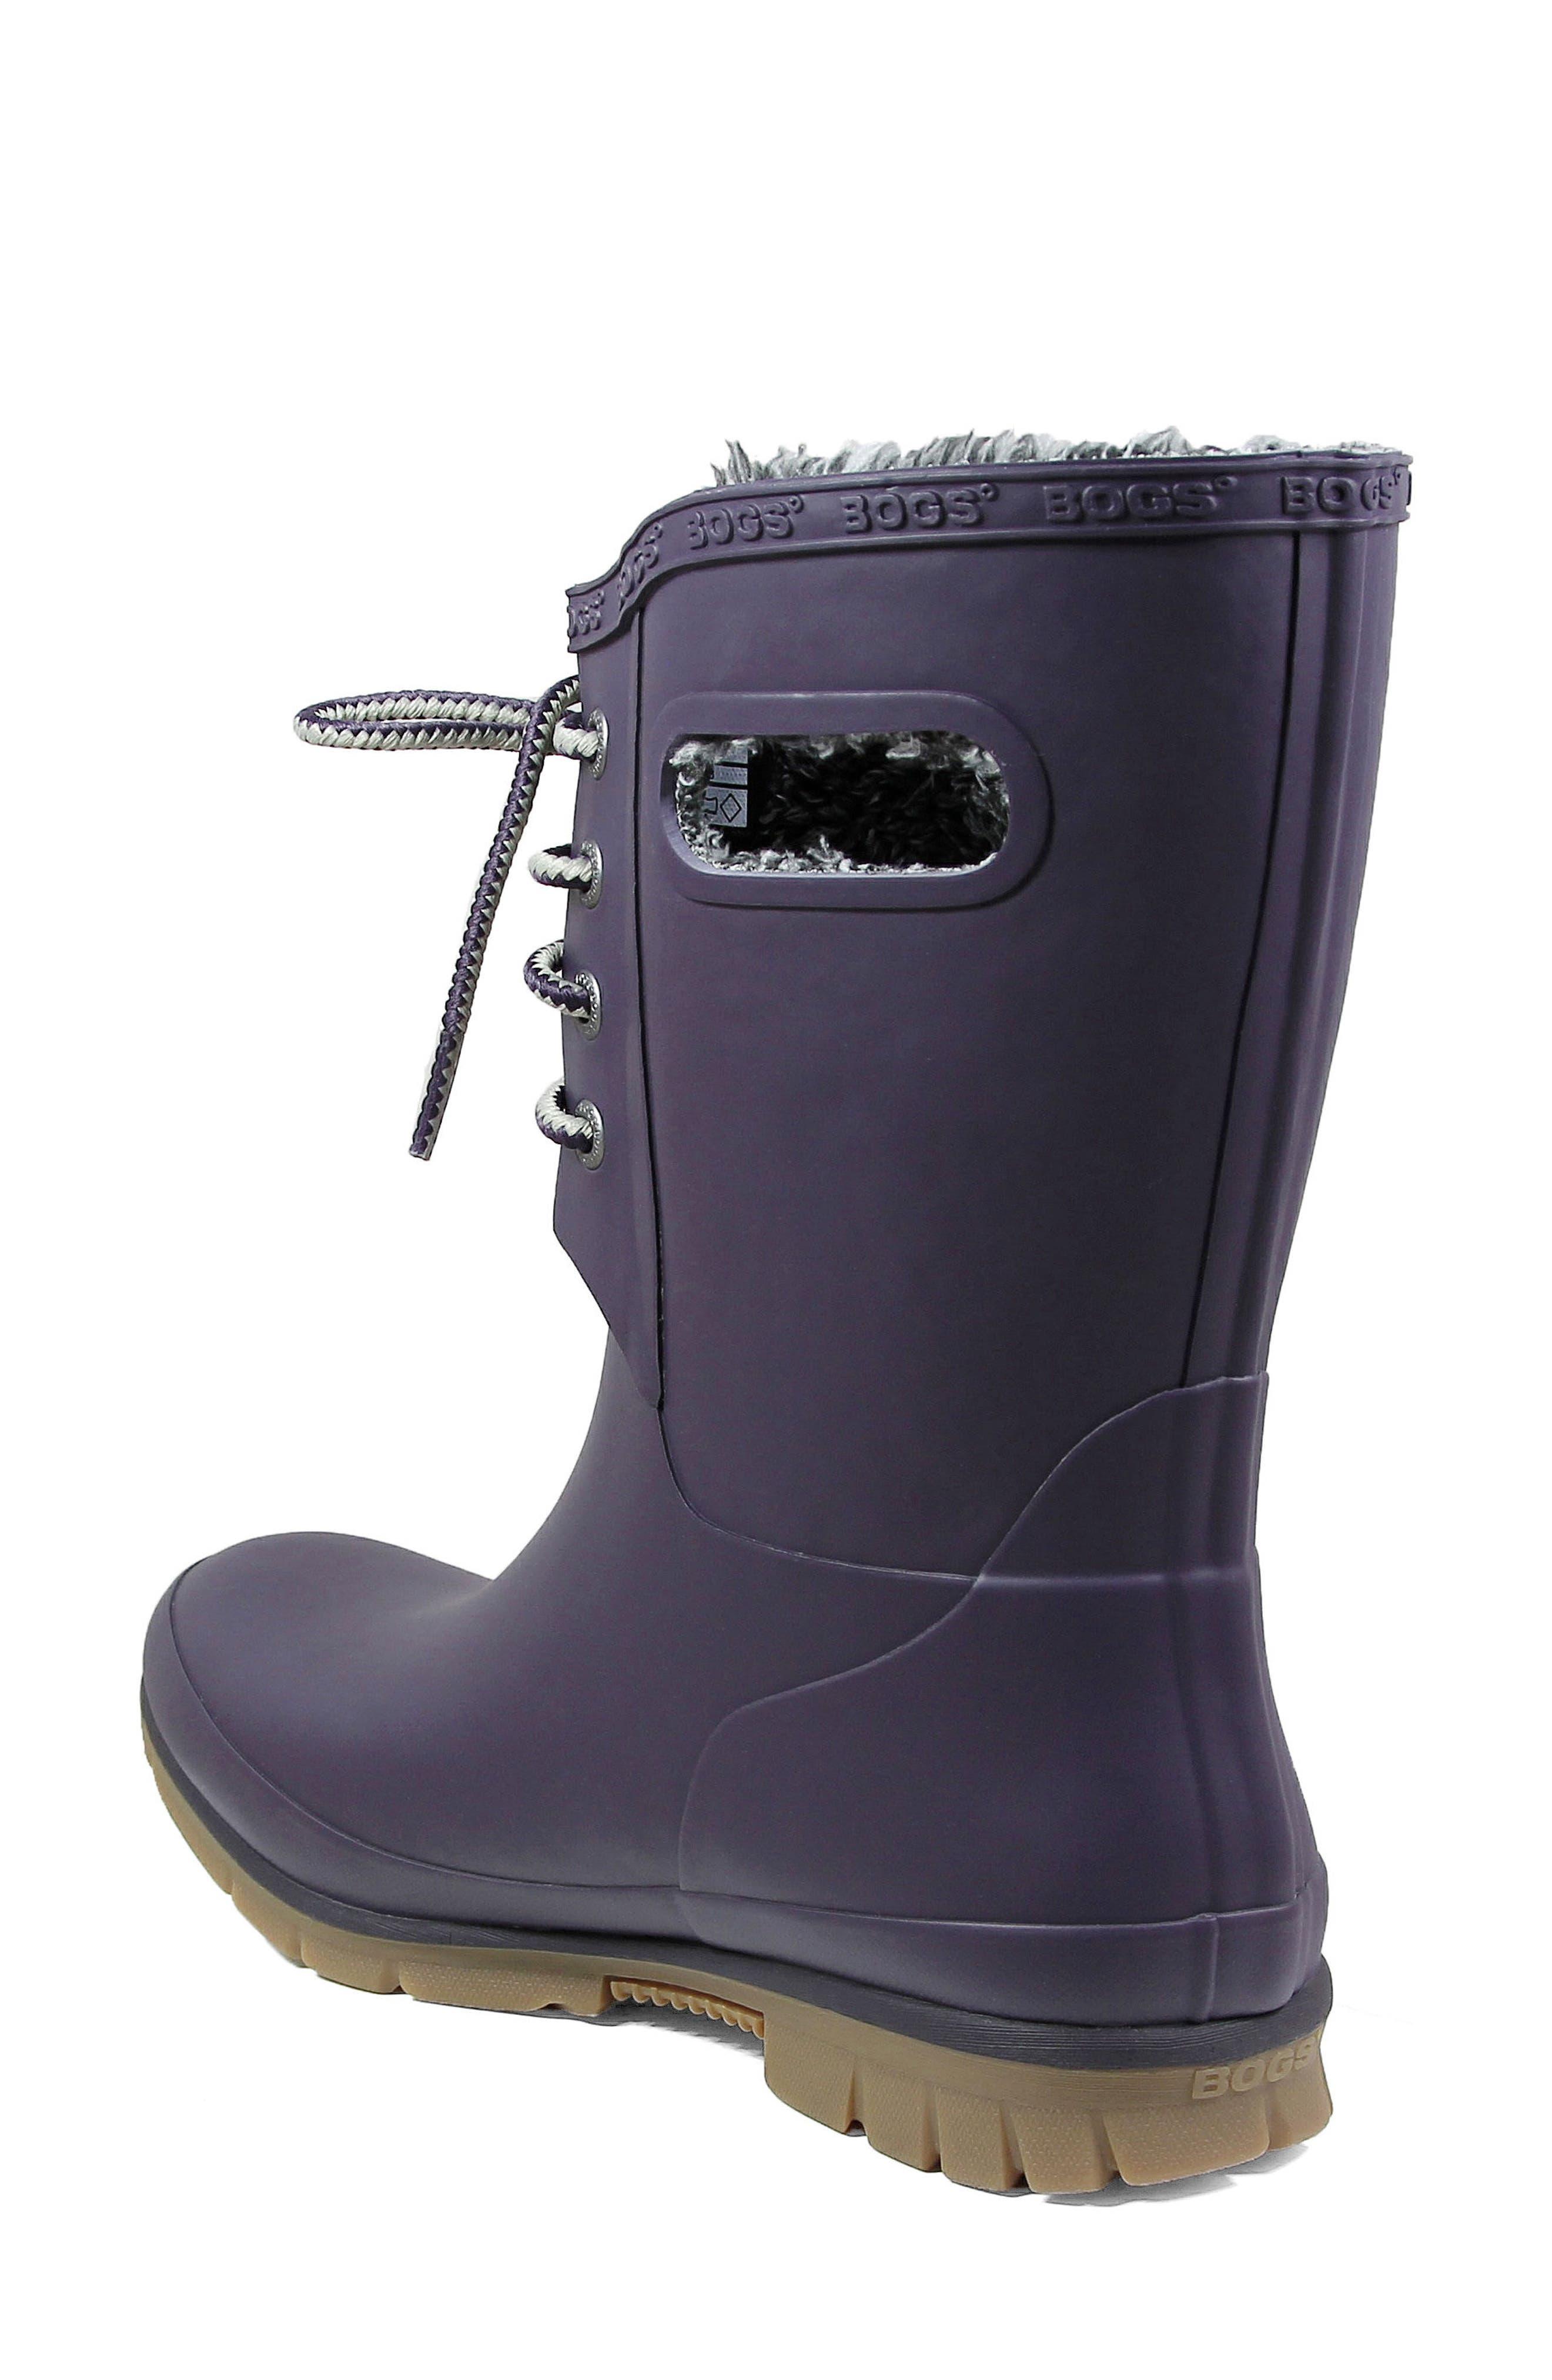 Alternate Image 2  - Bogs Amanda Plush Waterproof Rain Boot (Women)